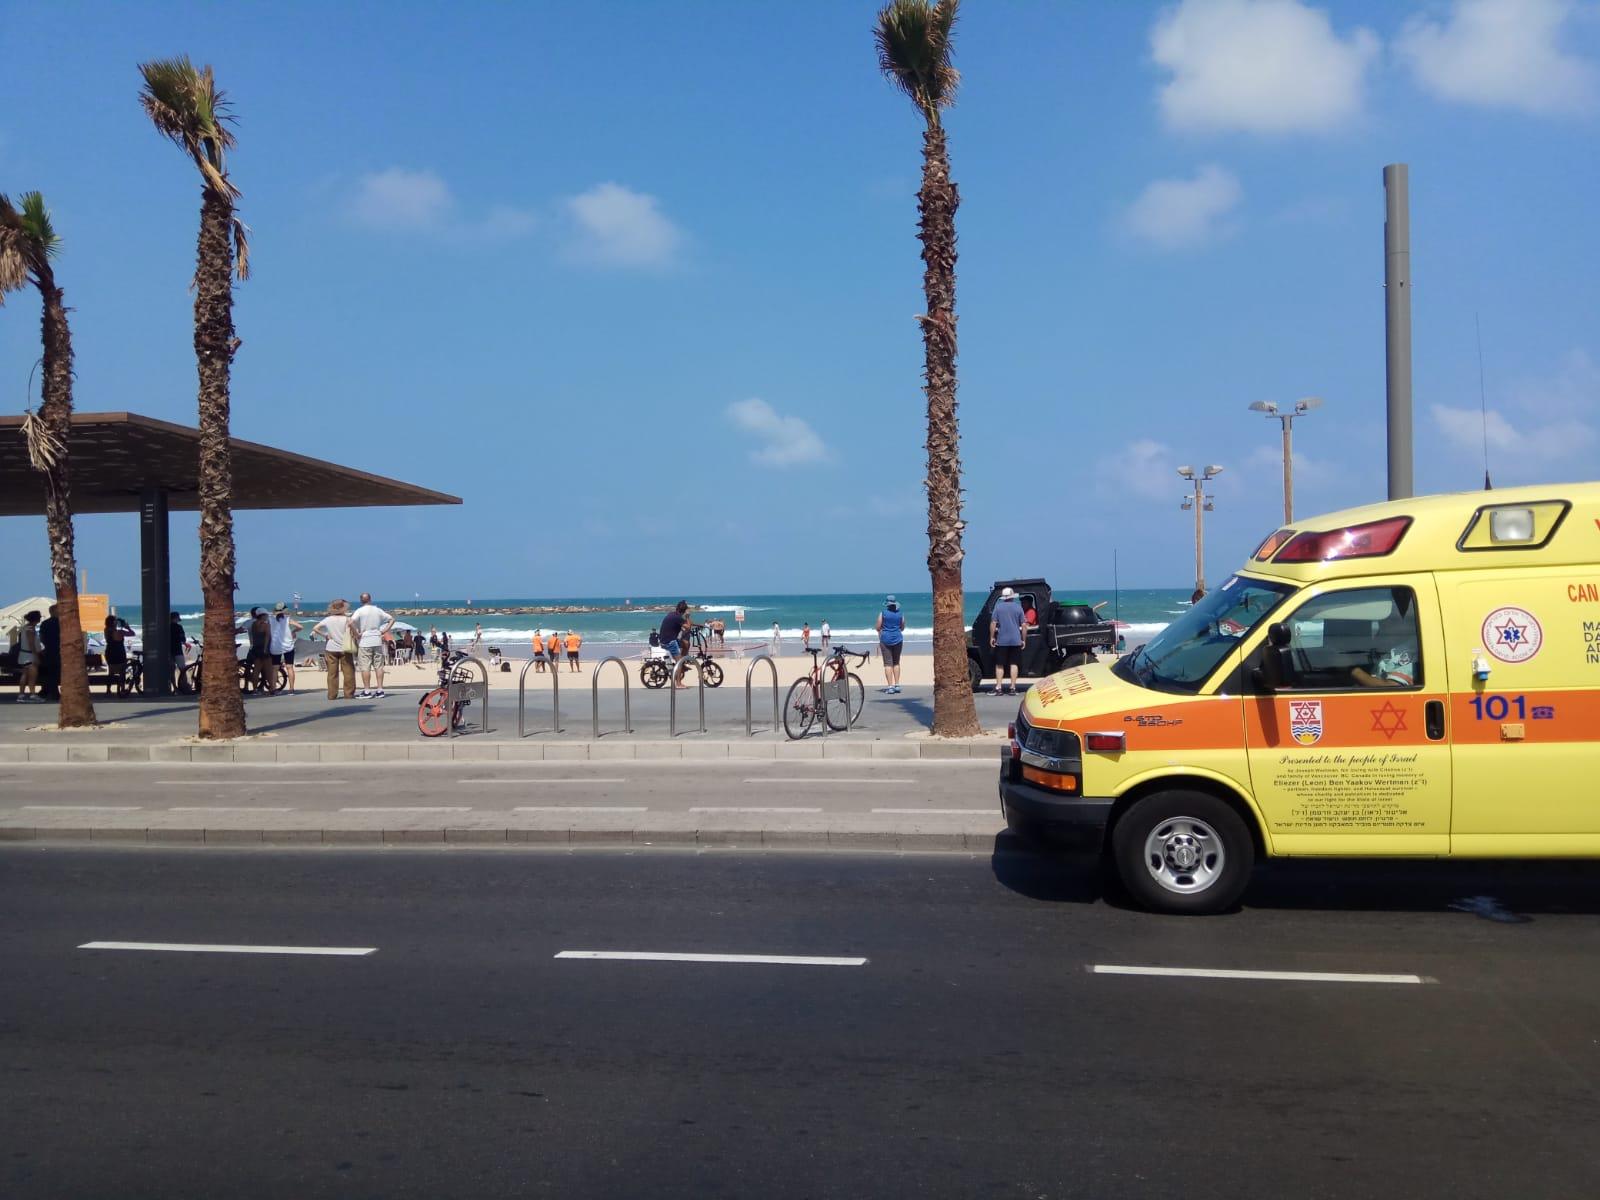 Photo of בשל ההצפות והסחף של אשפה: משרד הבריאות אוסר רחצה בכל חופי תל אביב-יפו